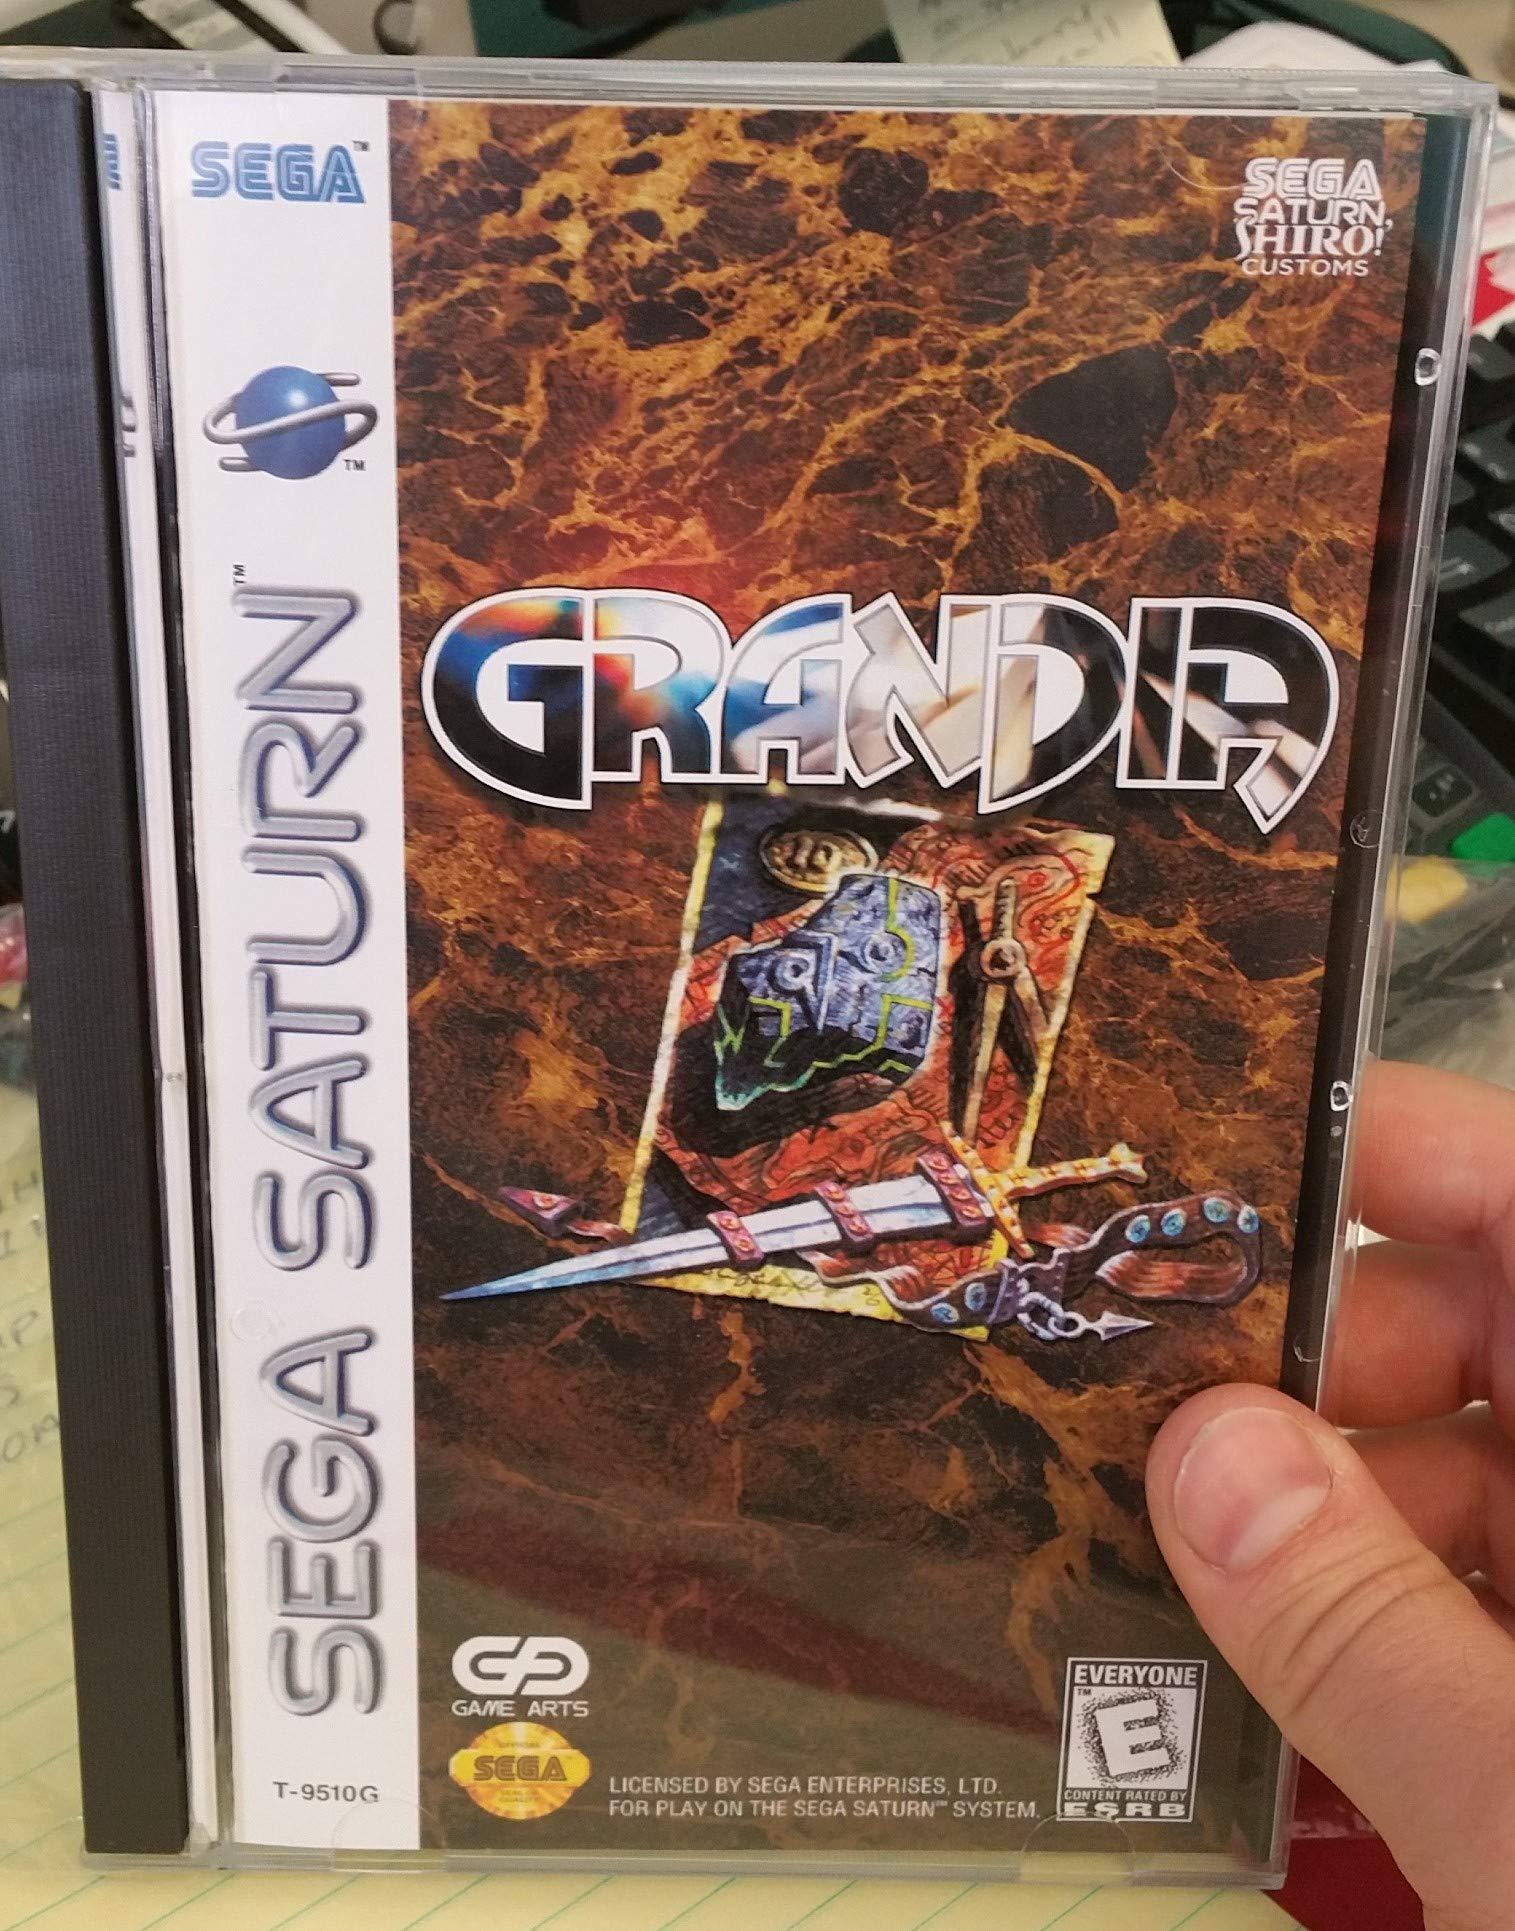 Sega CD / Sega Saturn replacement game cases 10 pack **SECOND RUN** by VGC online (Image #4)